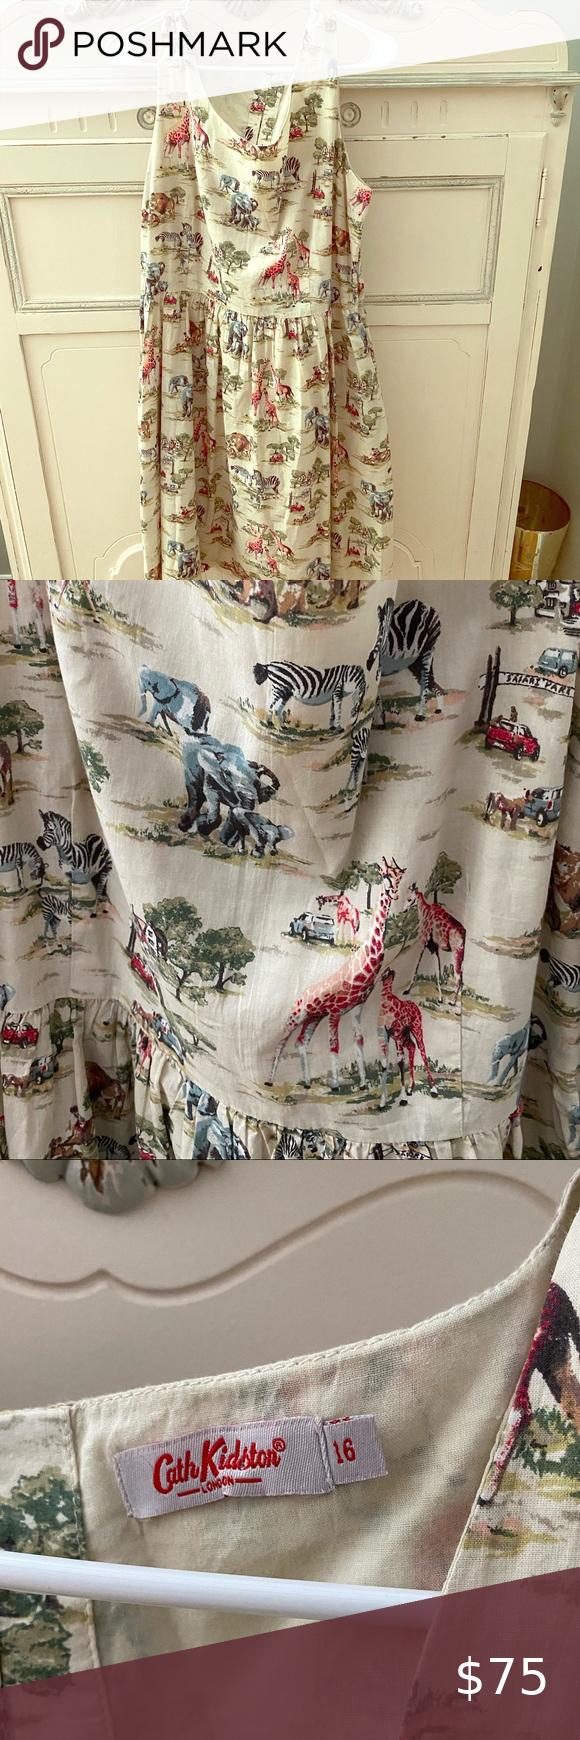 17+ Cath kidston safari dress ideas